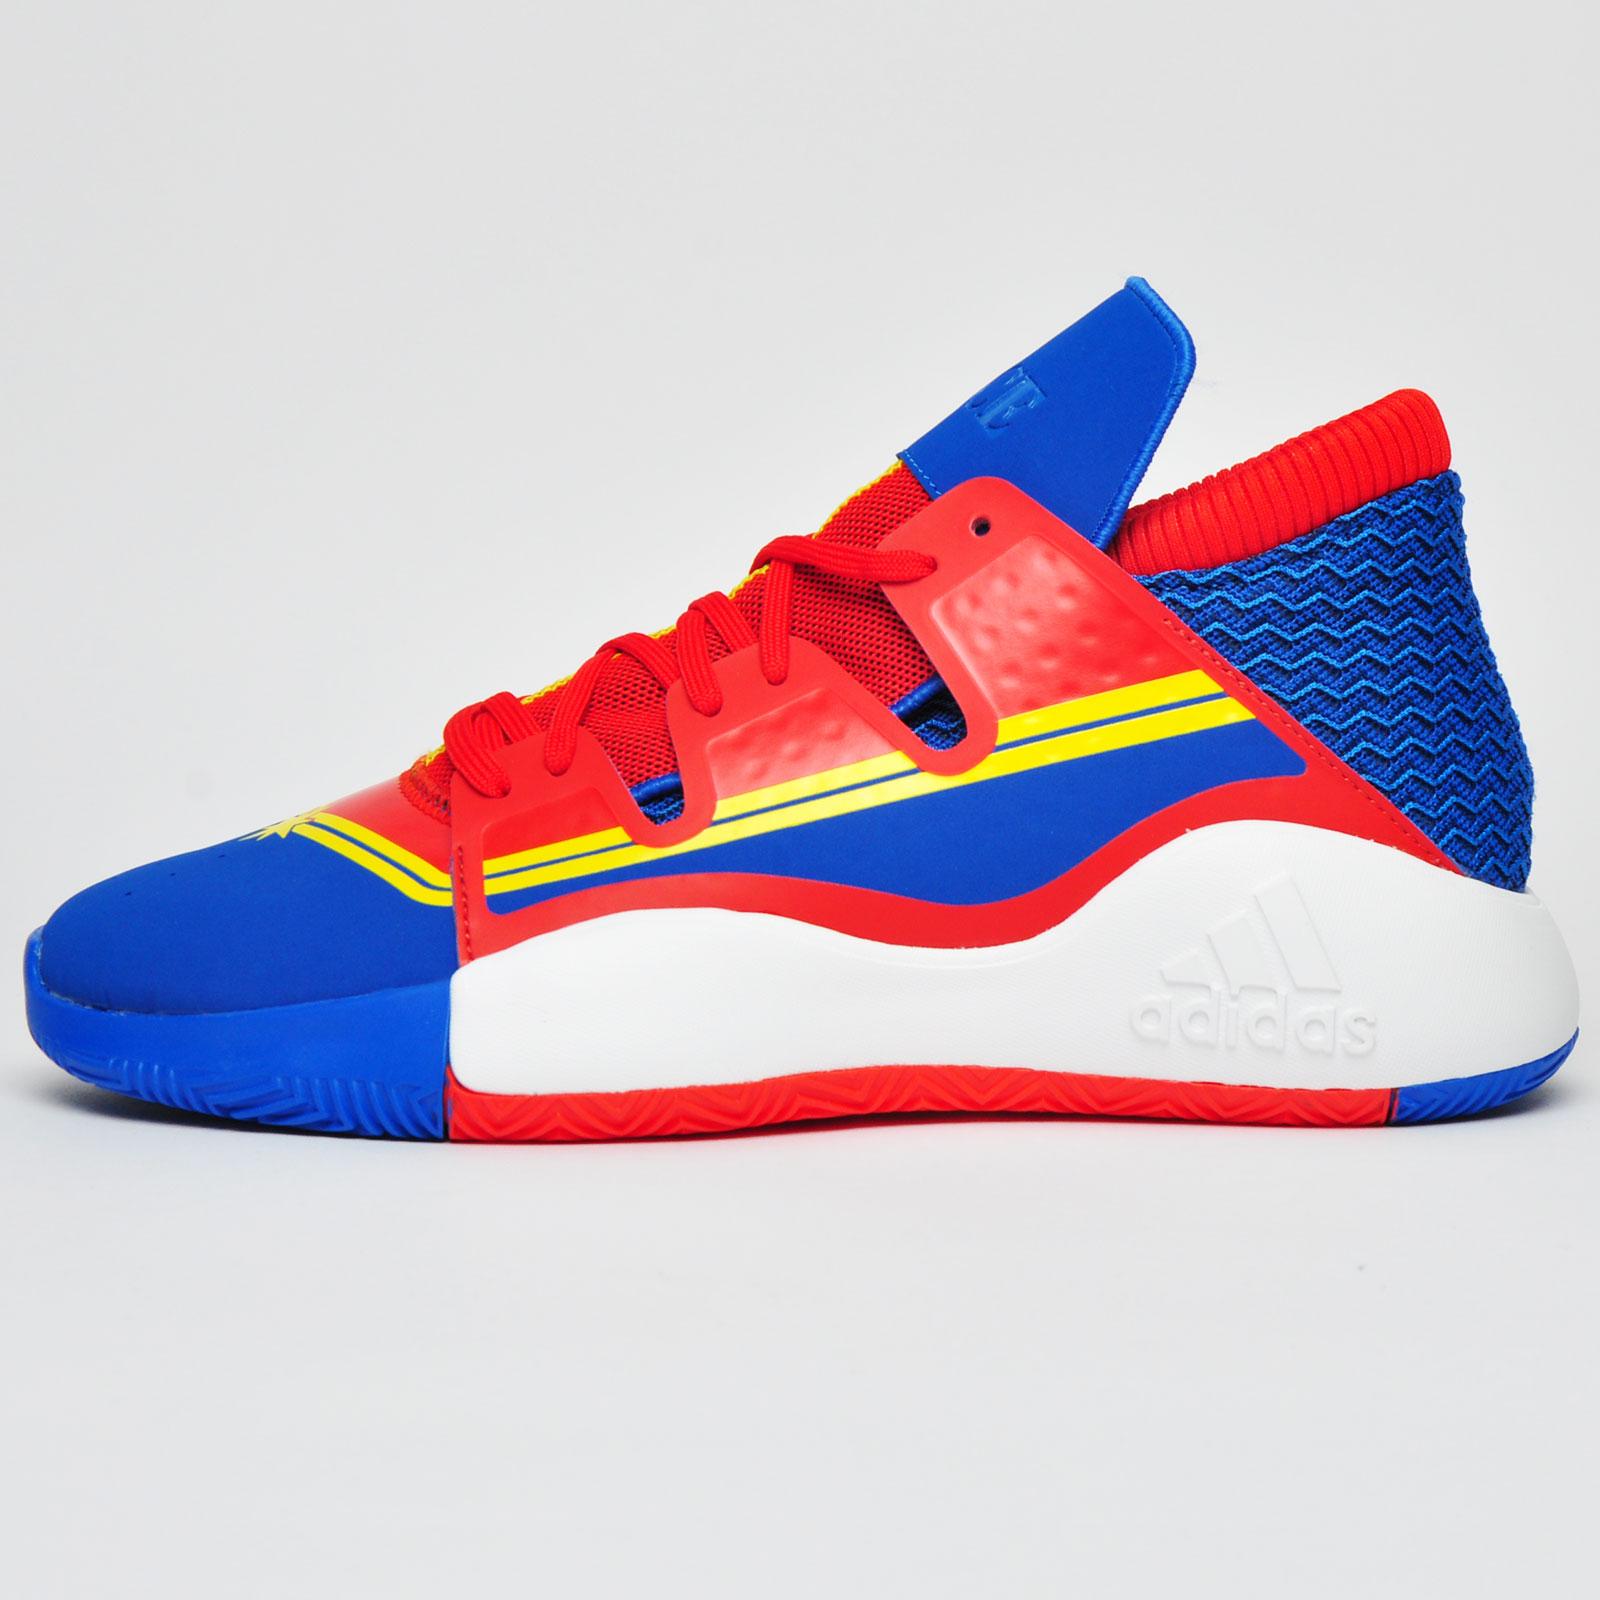 Adidas Pro Vision X Captain Marvel Mens